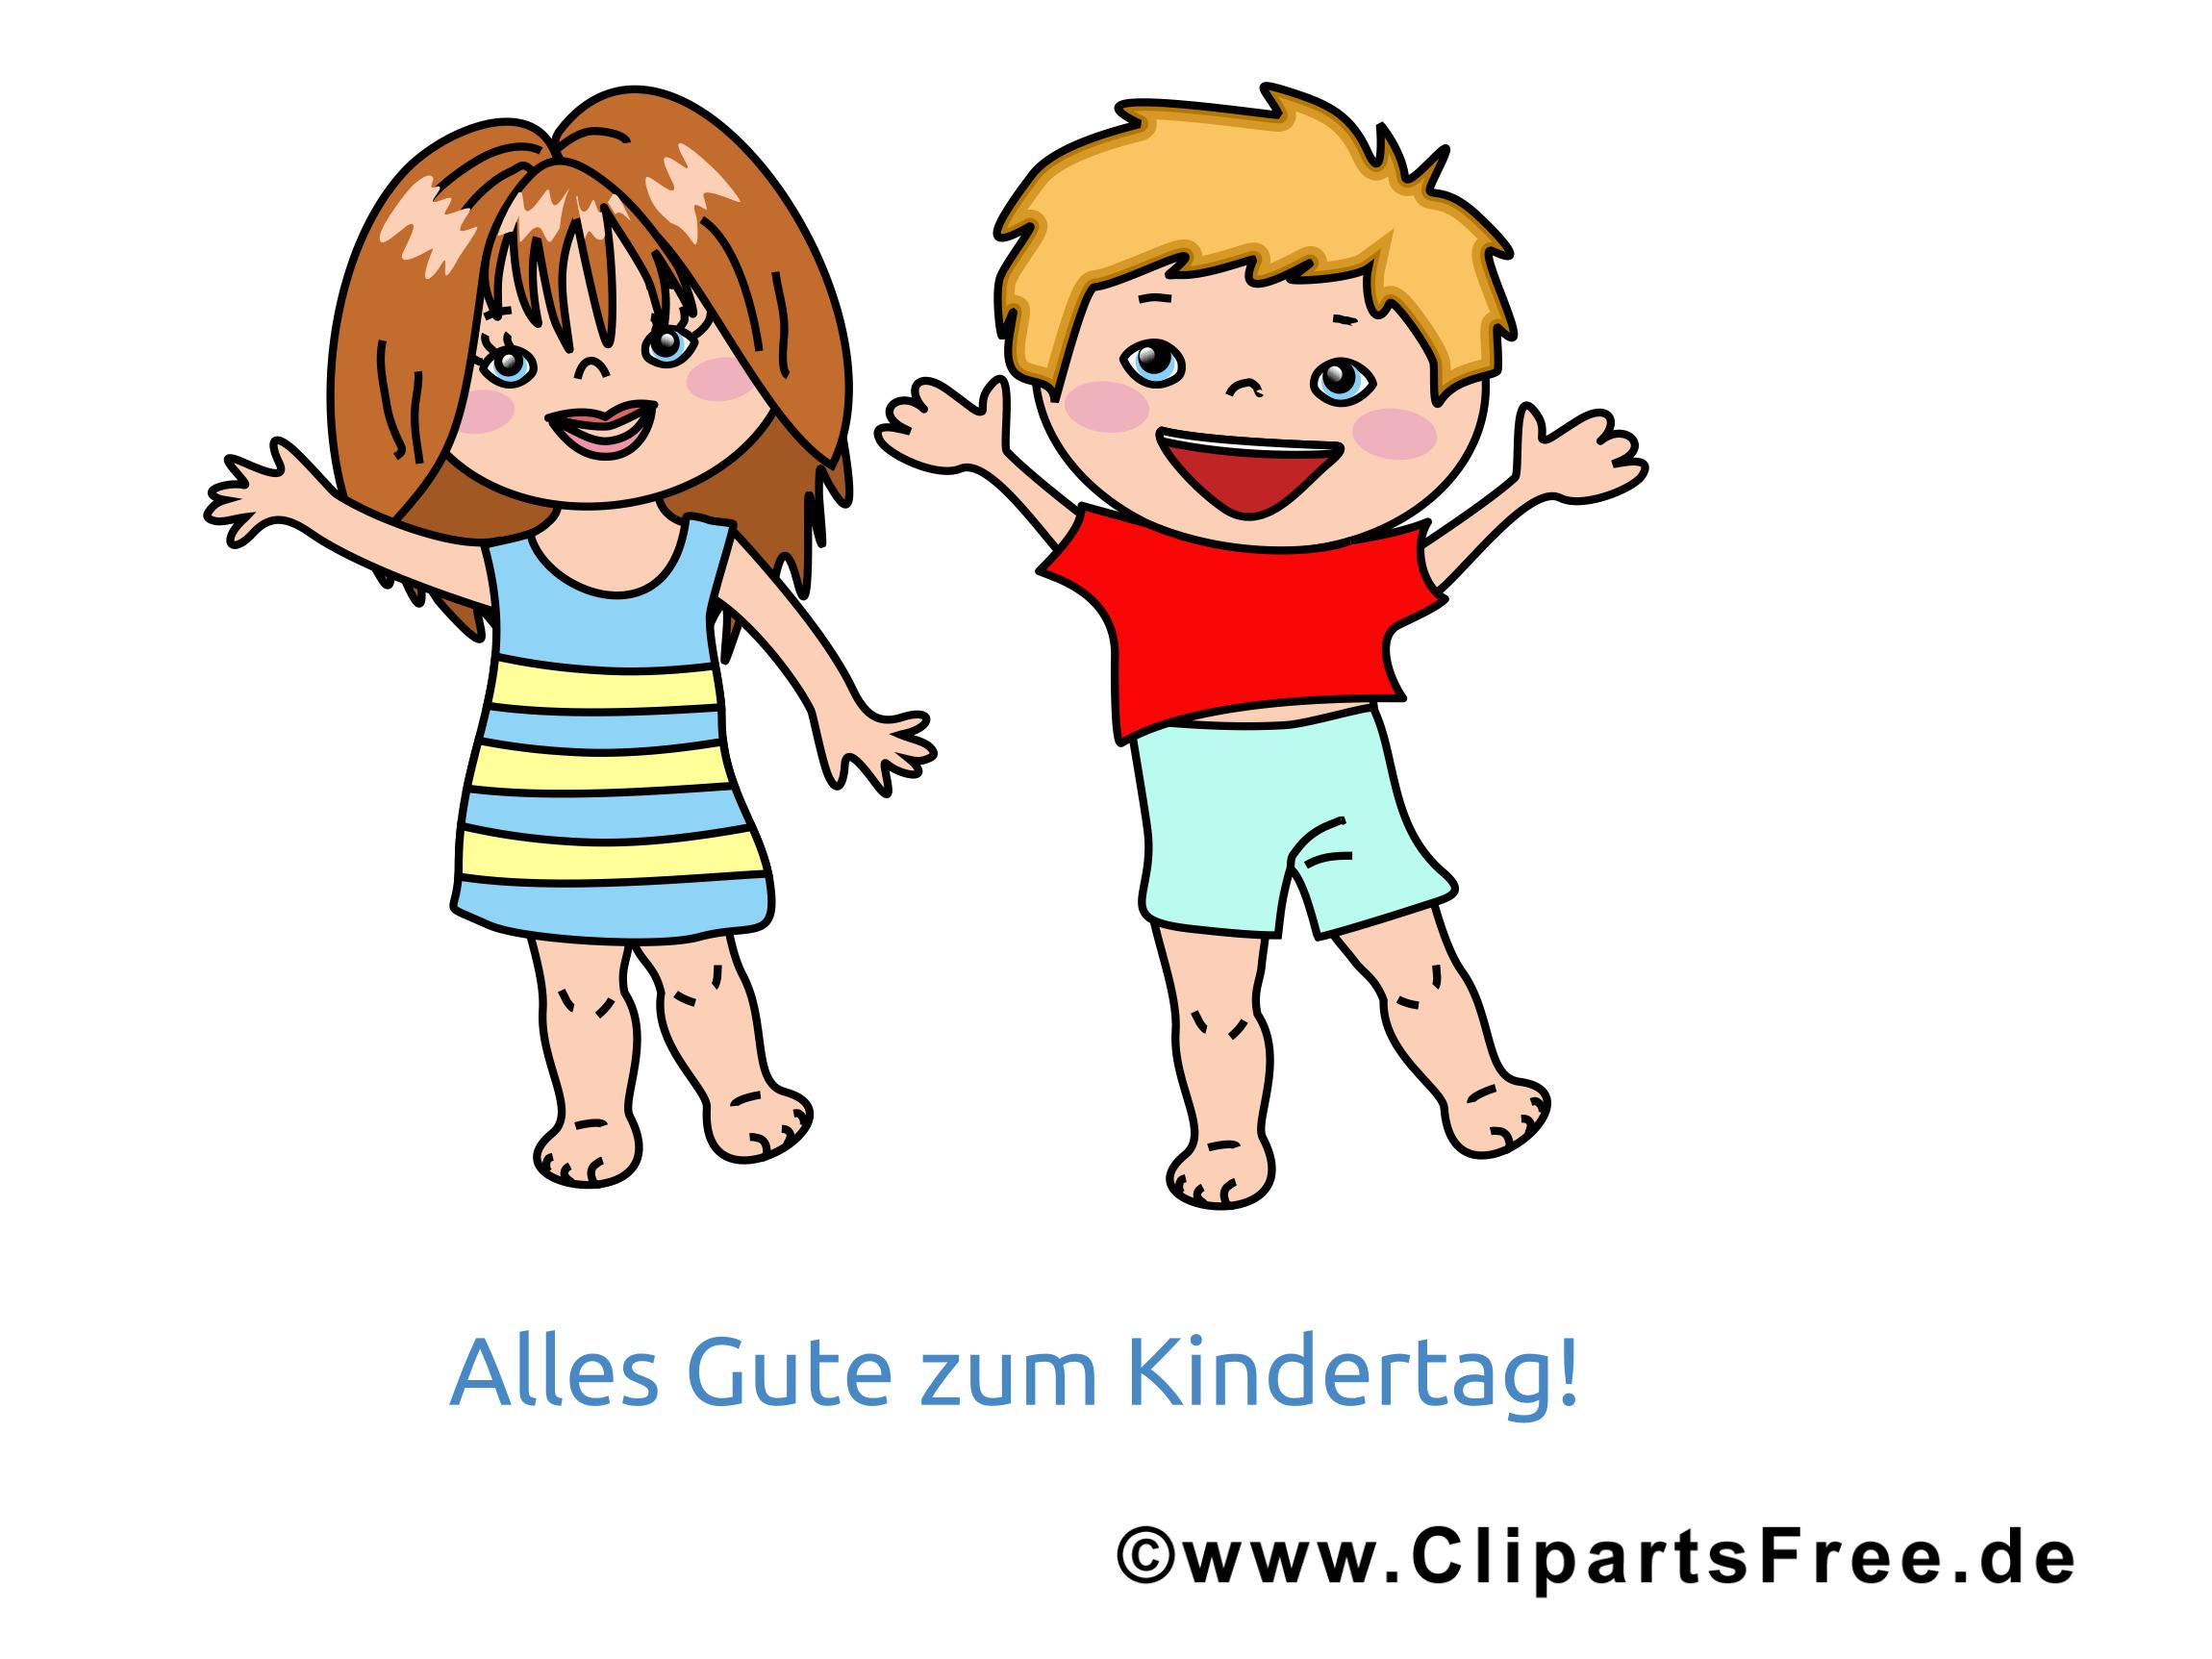 Internationaler Kindertag Bild, Grusskarte, Clipart.